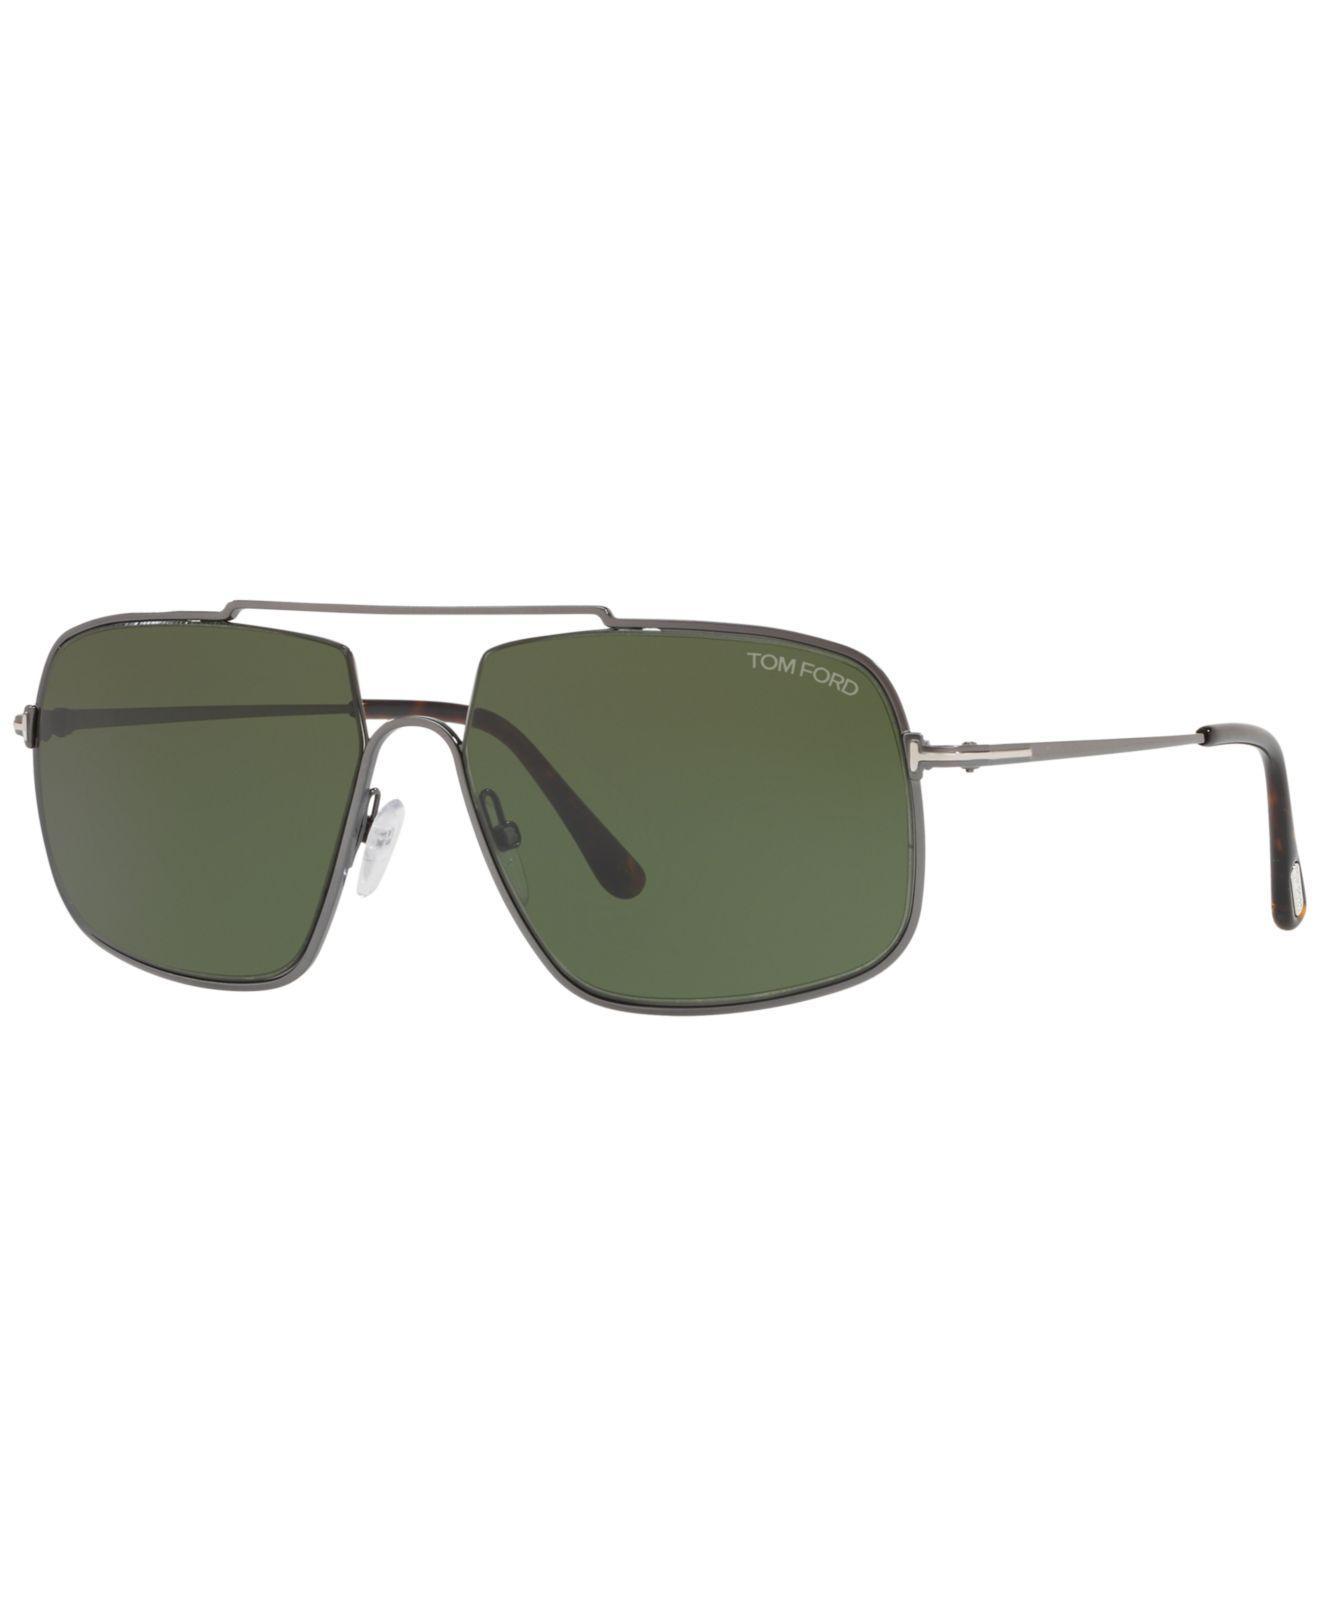 130f4f03890 Tom Ford - Green Sunglasses